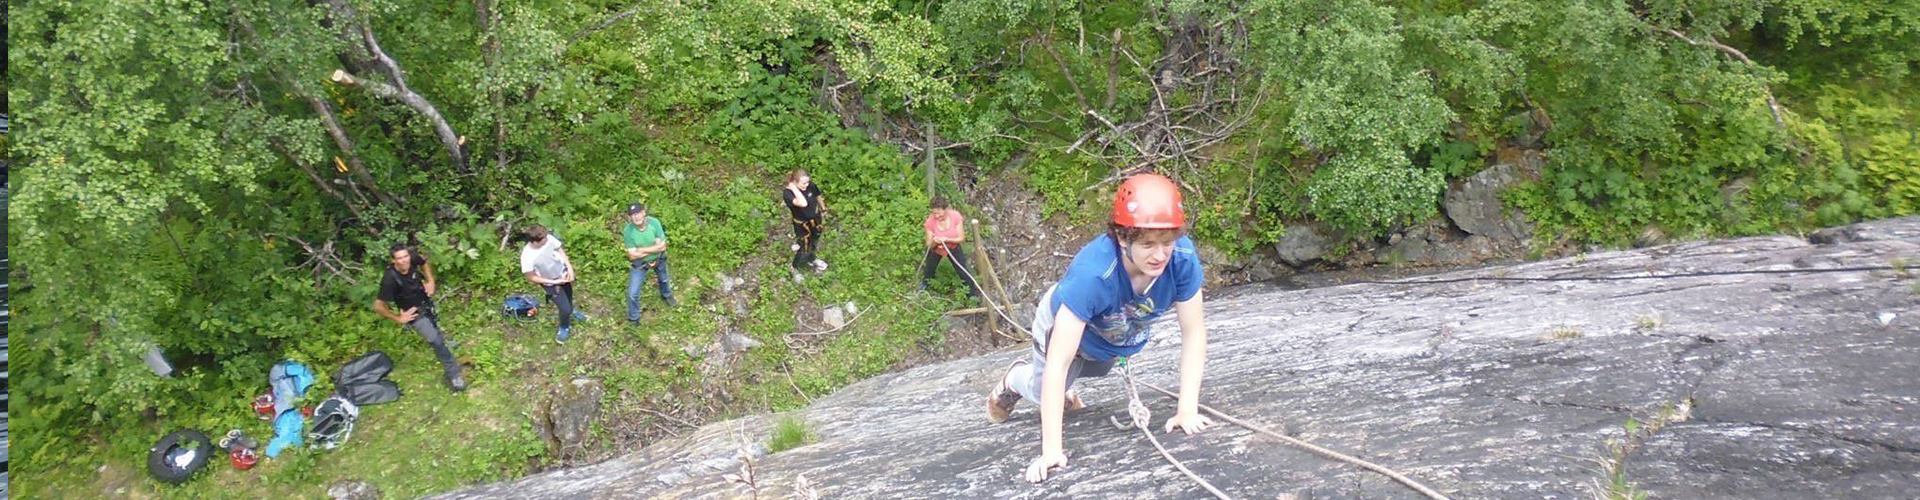 Bøflaten-klatring